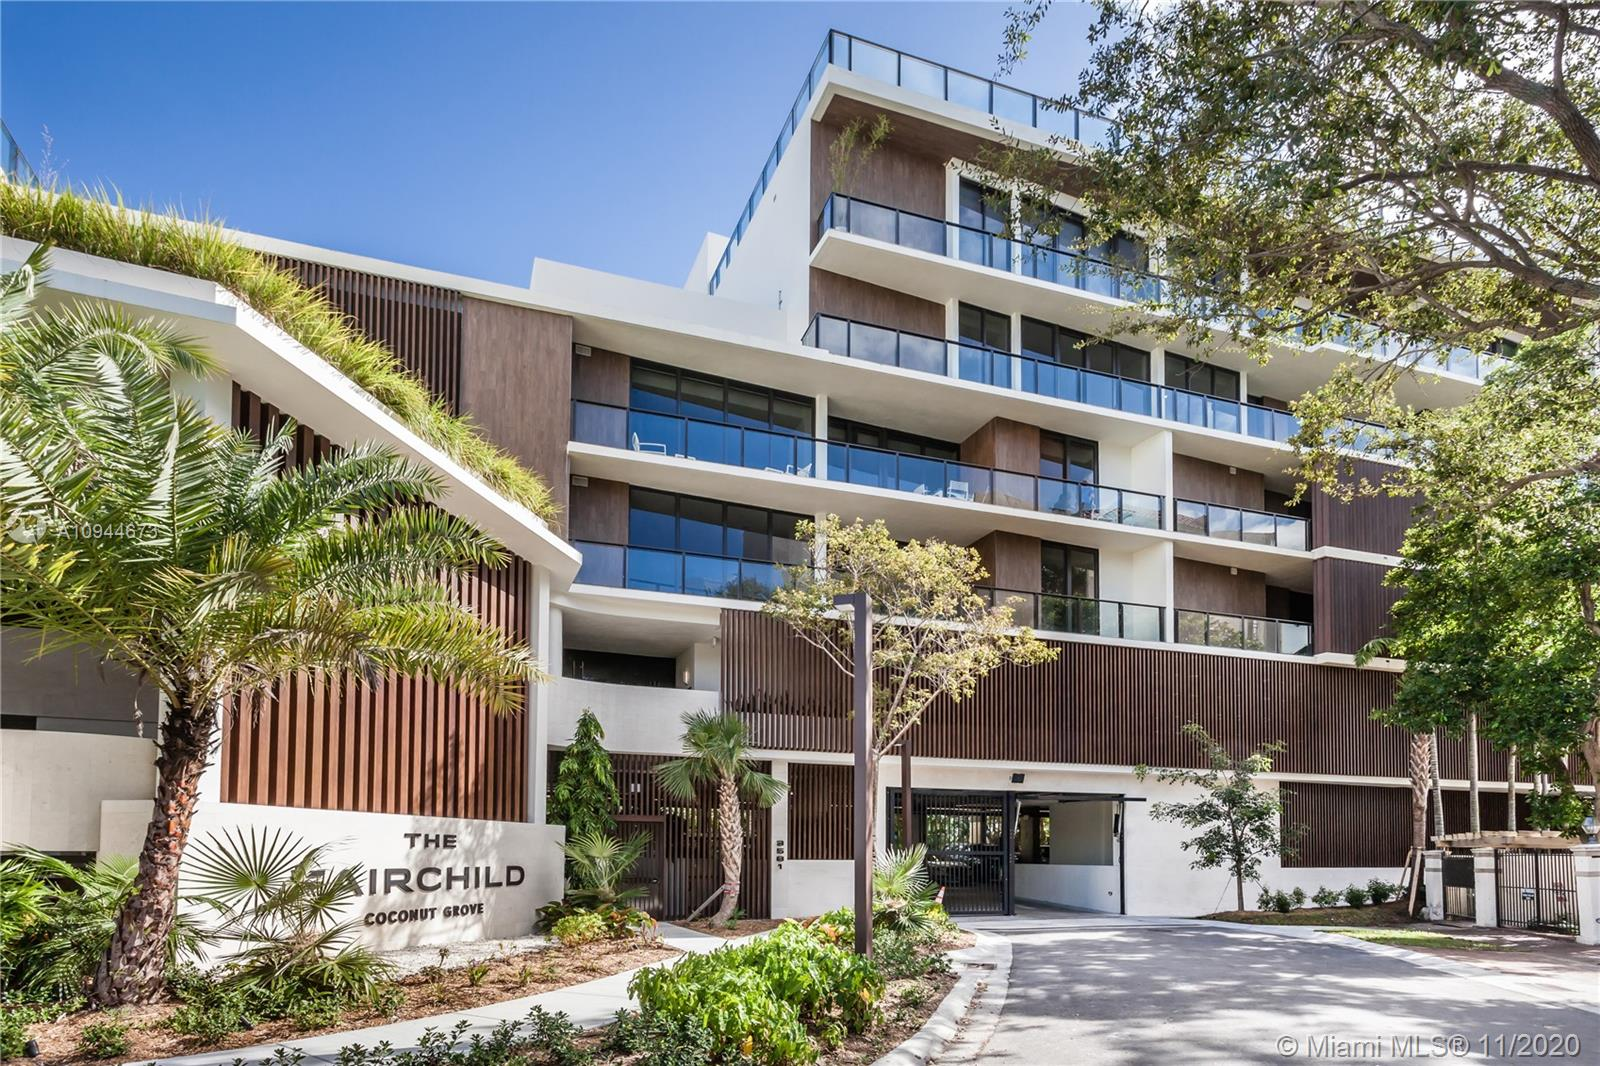 The Fairchild Coconut Grove #306 - 3581 E Glencoe St #306, Miami, FL 33133